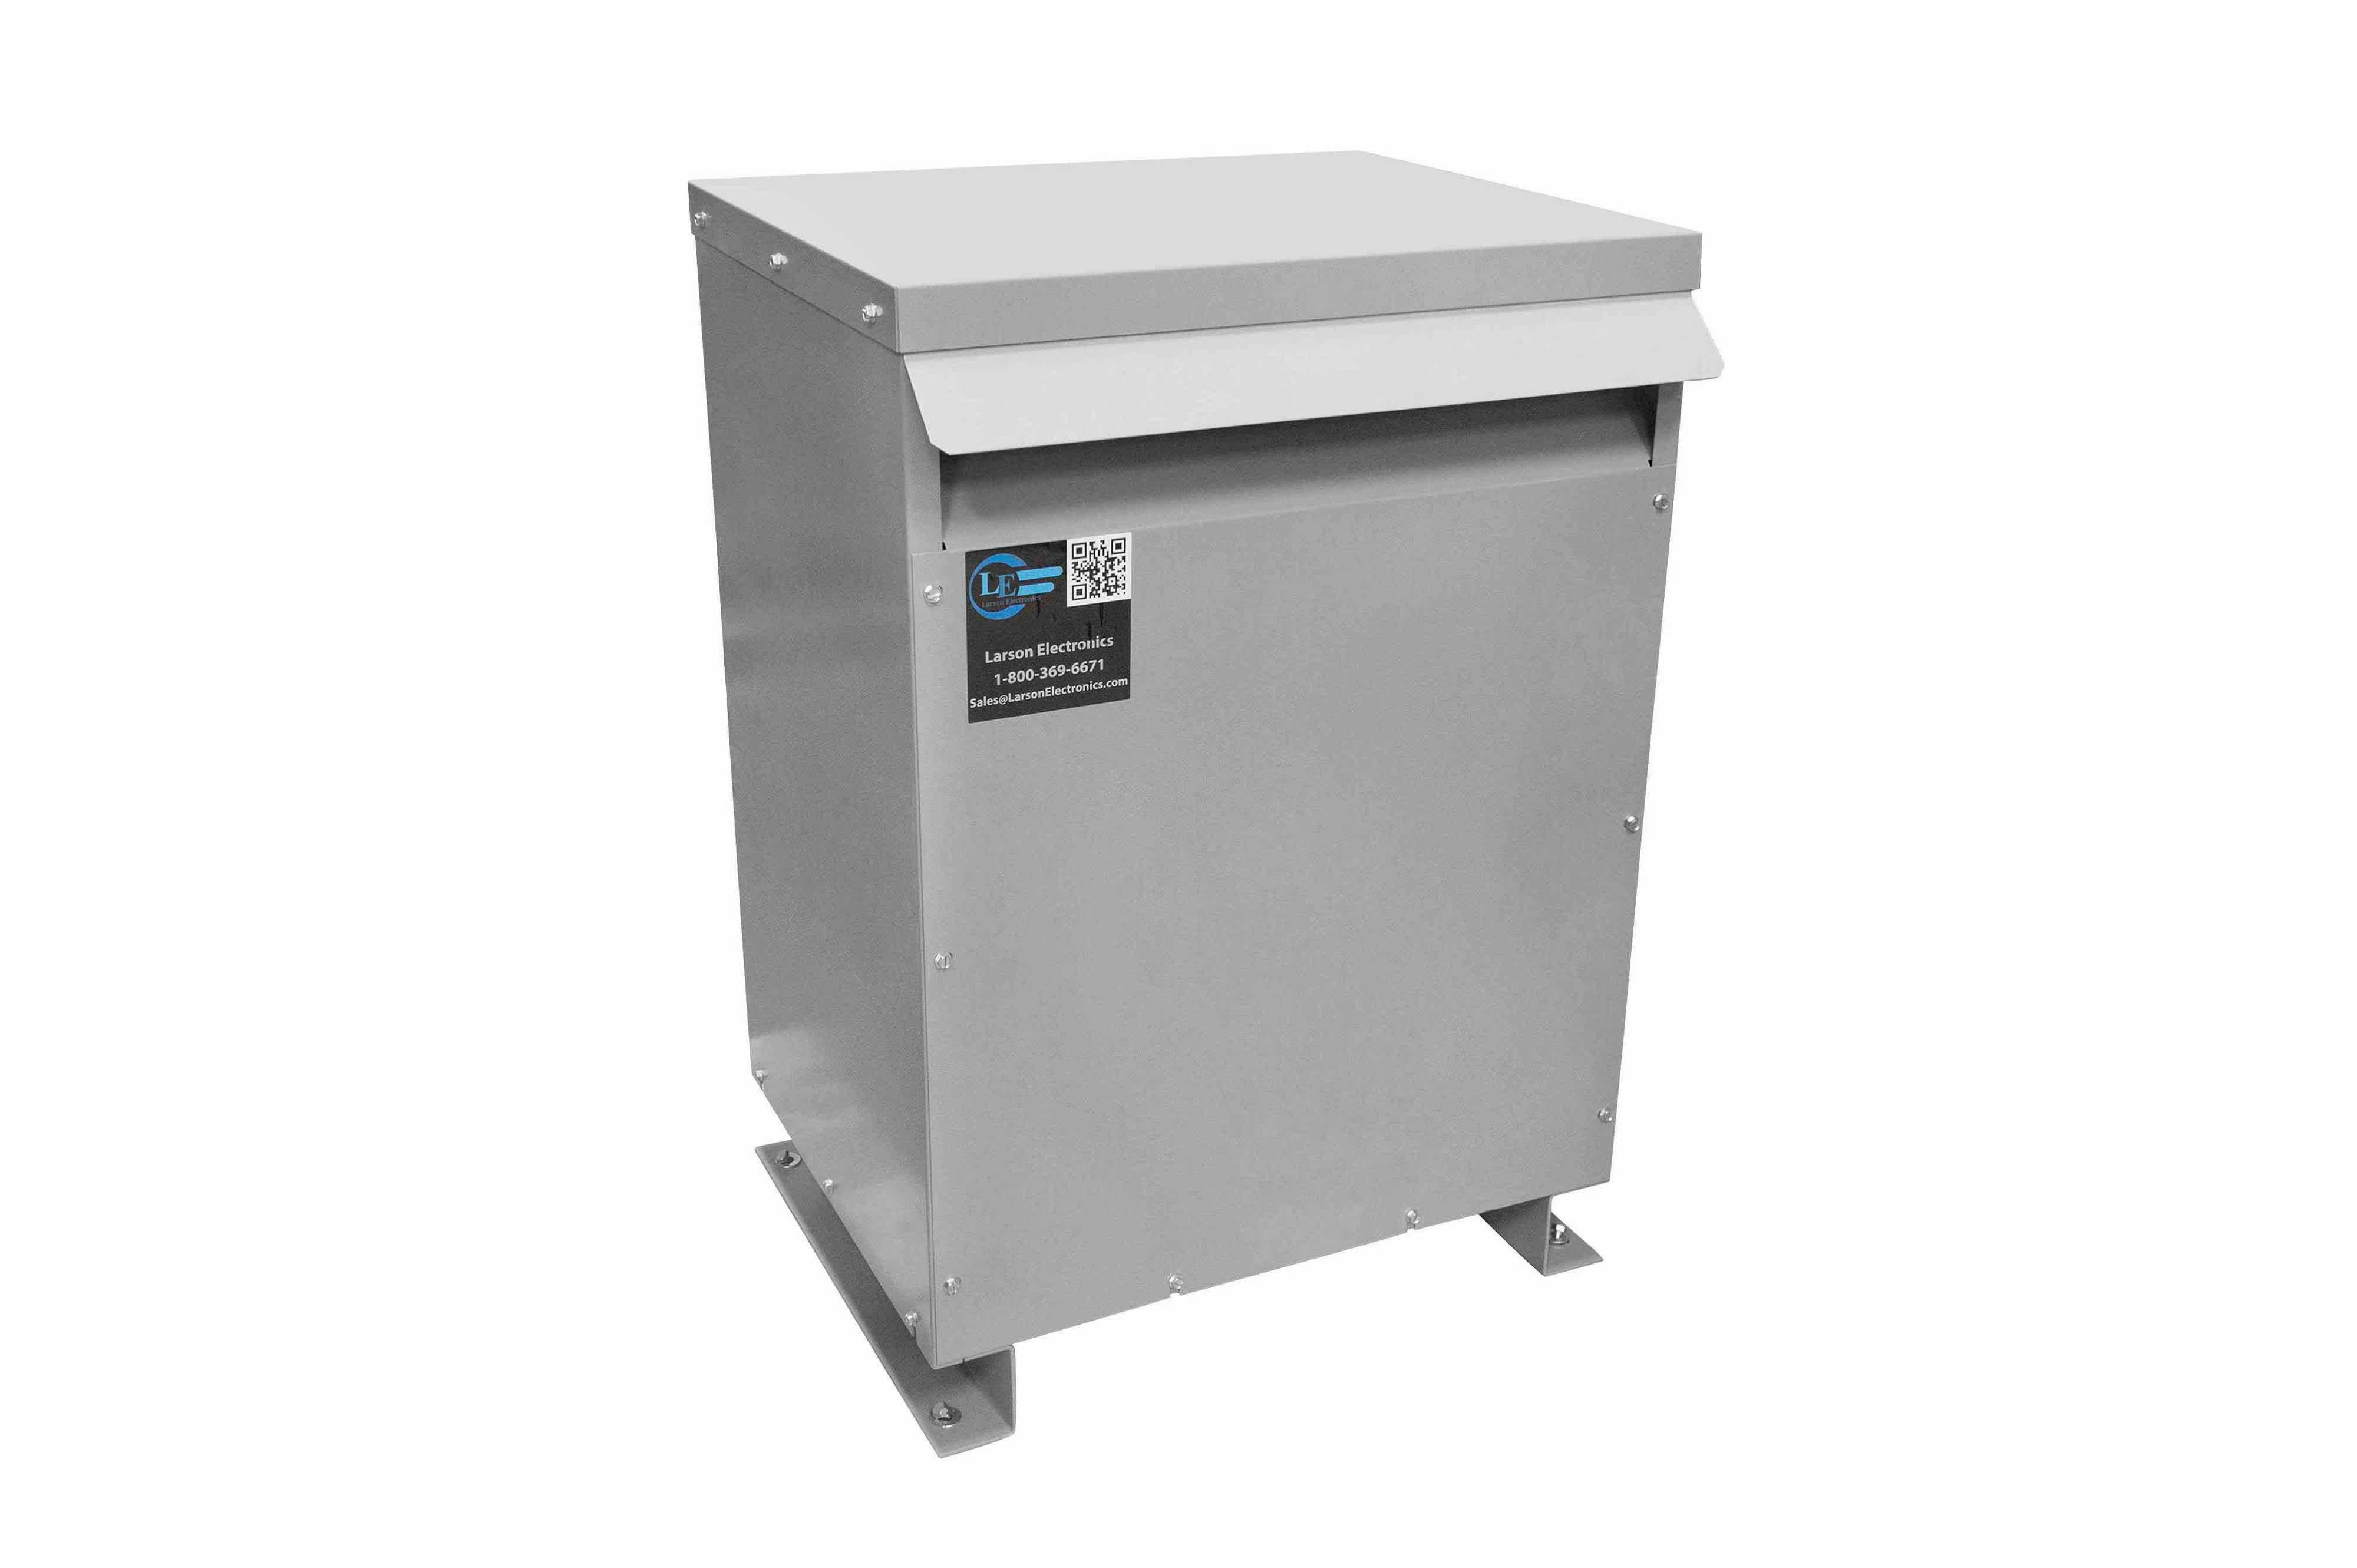 900 kVA 3PH Isolation Transformer, 415V Wye Primary, 600Y/347 Wye-N Secondary, N3R, Ventilated, 60 Hz